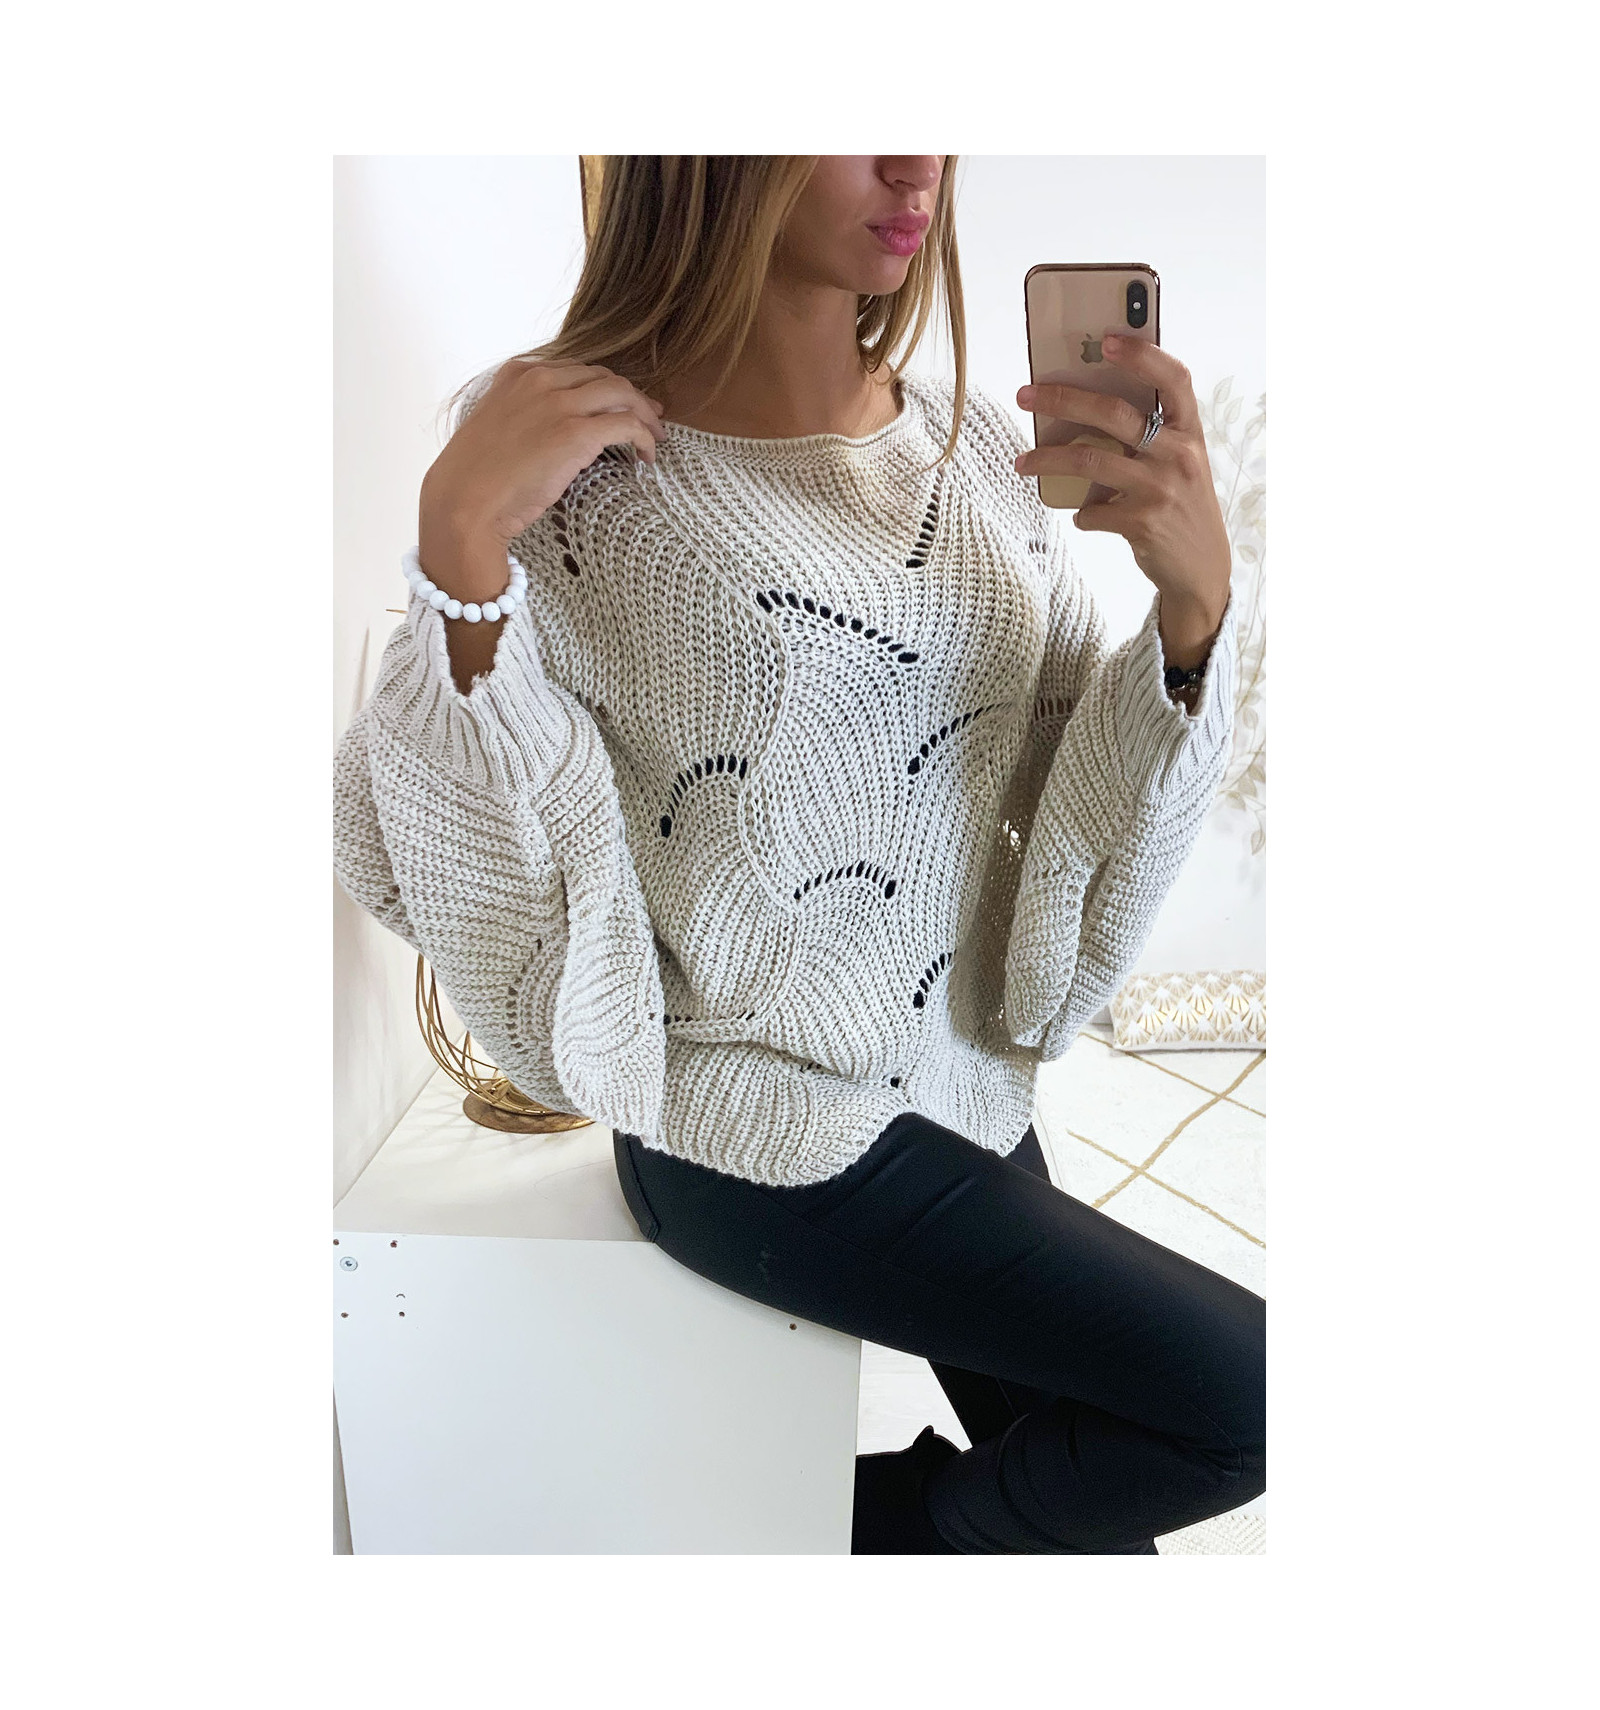 Magnifique pull poncho gris avec de joli motif tressé. Mode